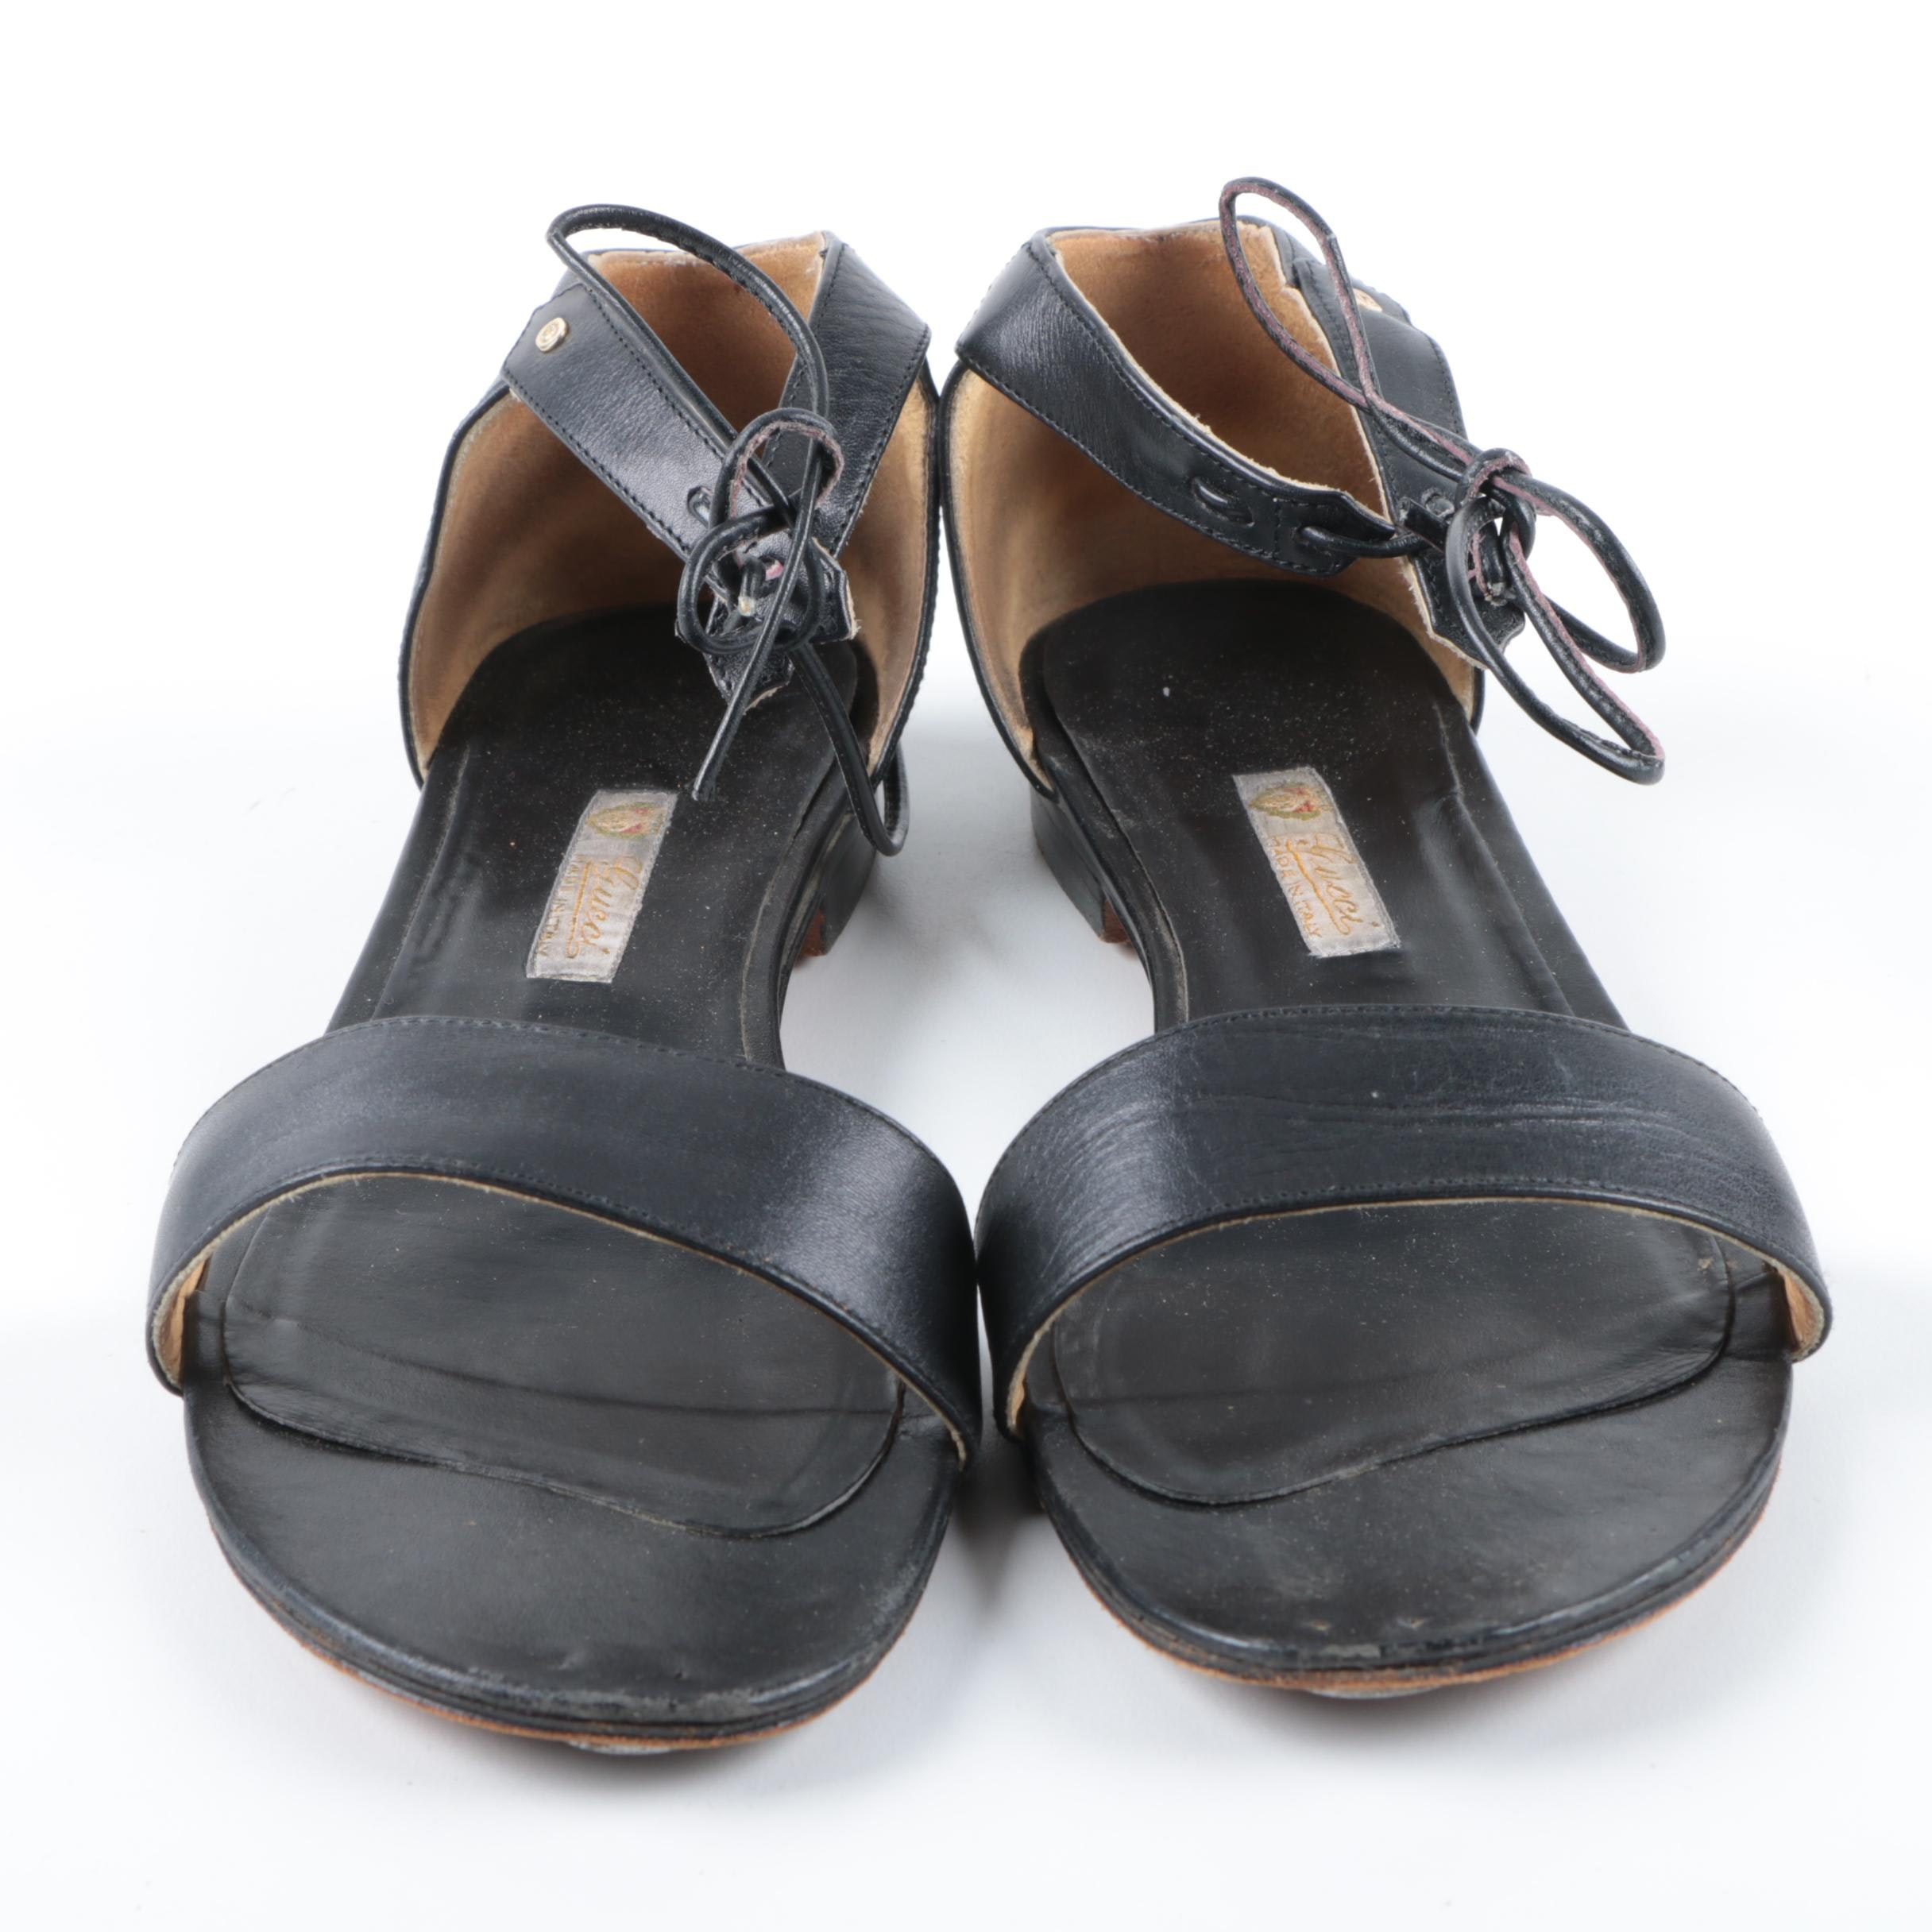 Vintage Gucci Black Leather Ankle Strap Sandals